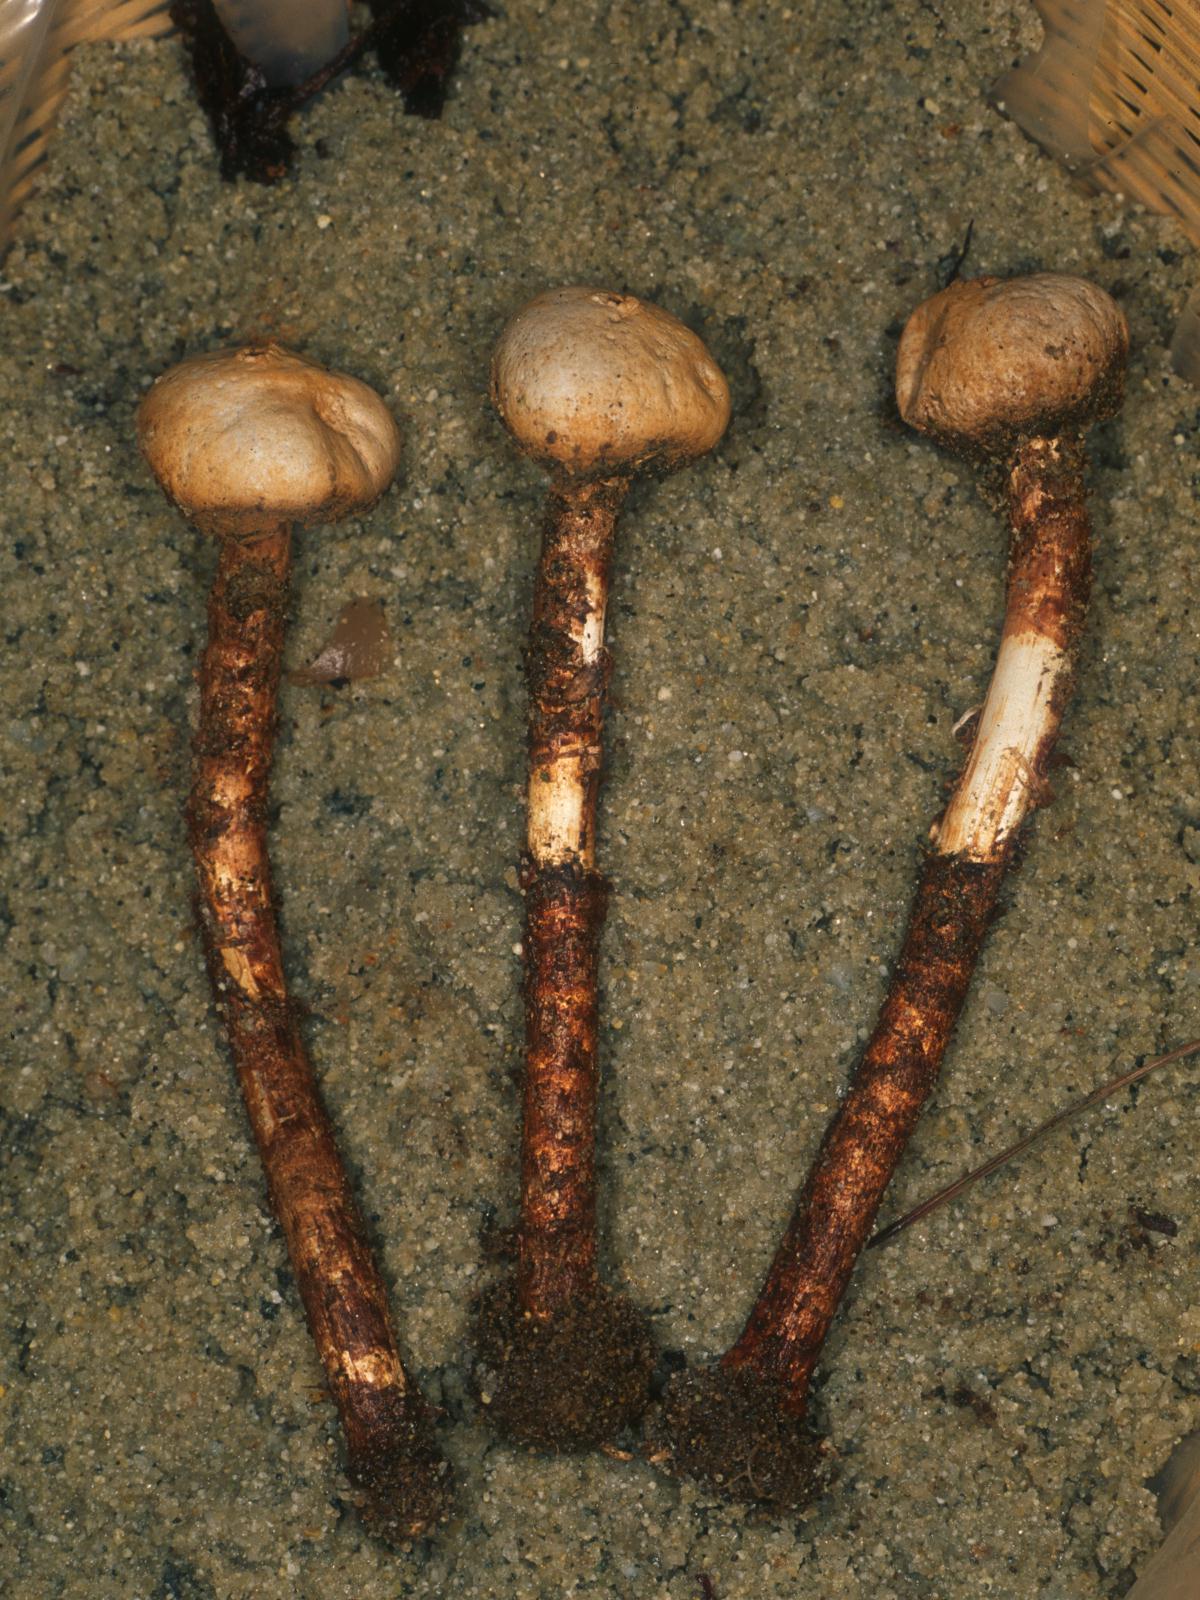 Tulostoma macrocephalum image